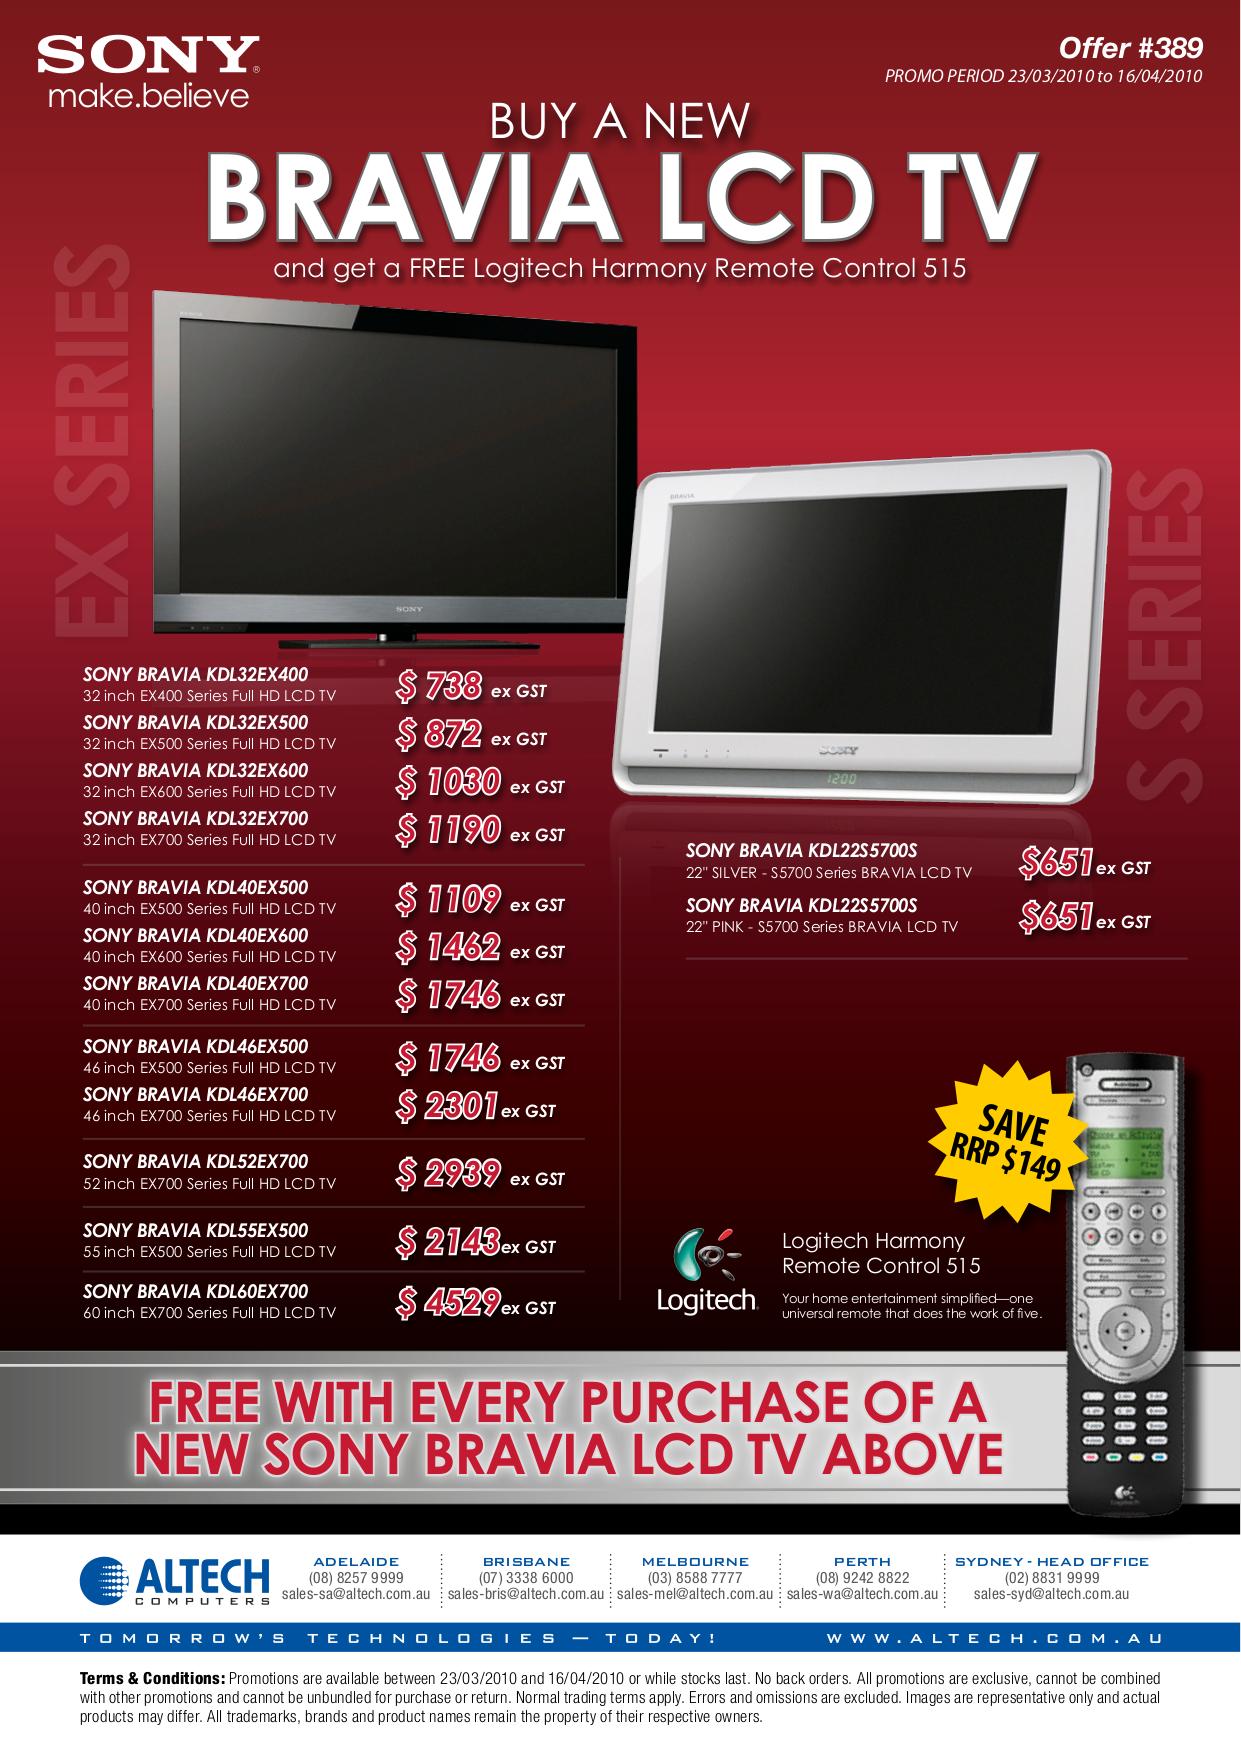 download free pdf for sony bravia kdl 32ex400 tv manual rh umlib com sony kdl-32bx400 user manual sony kdl-32bx400 user manual